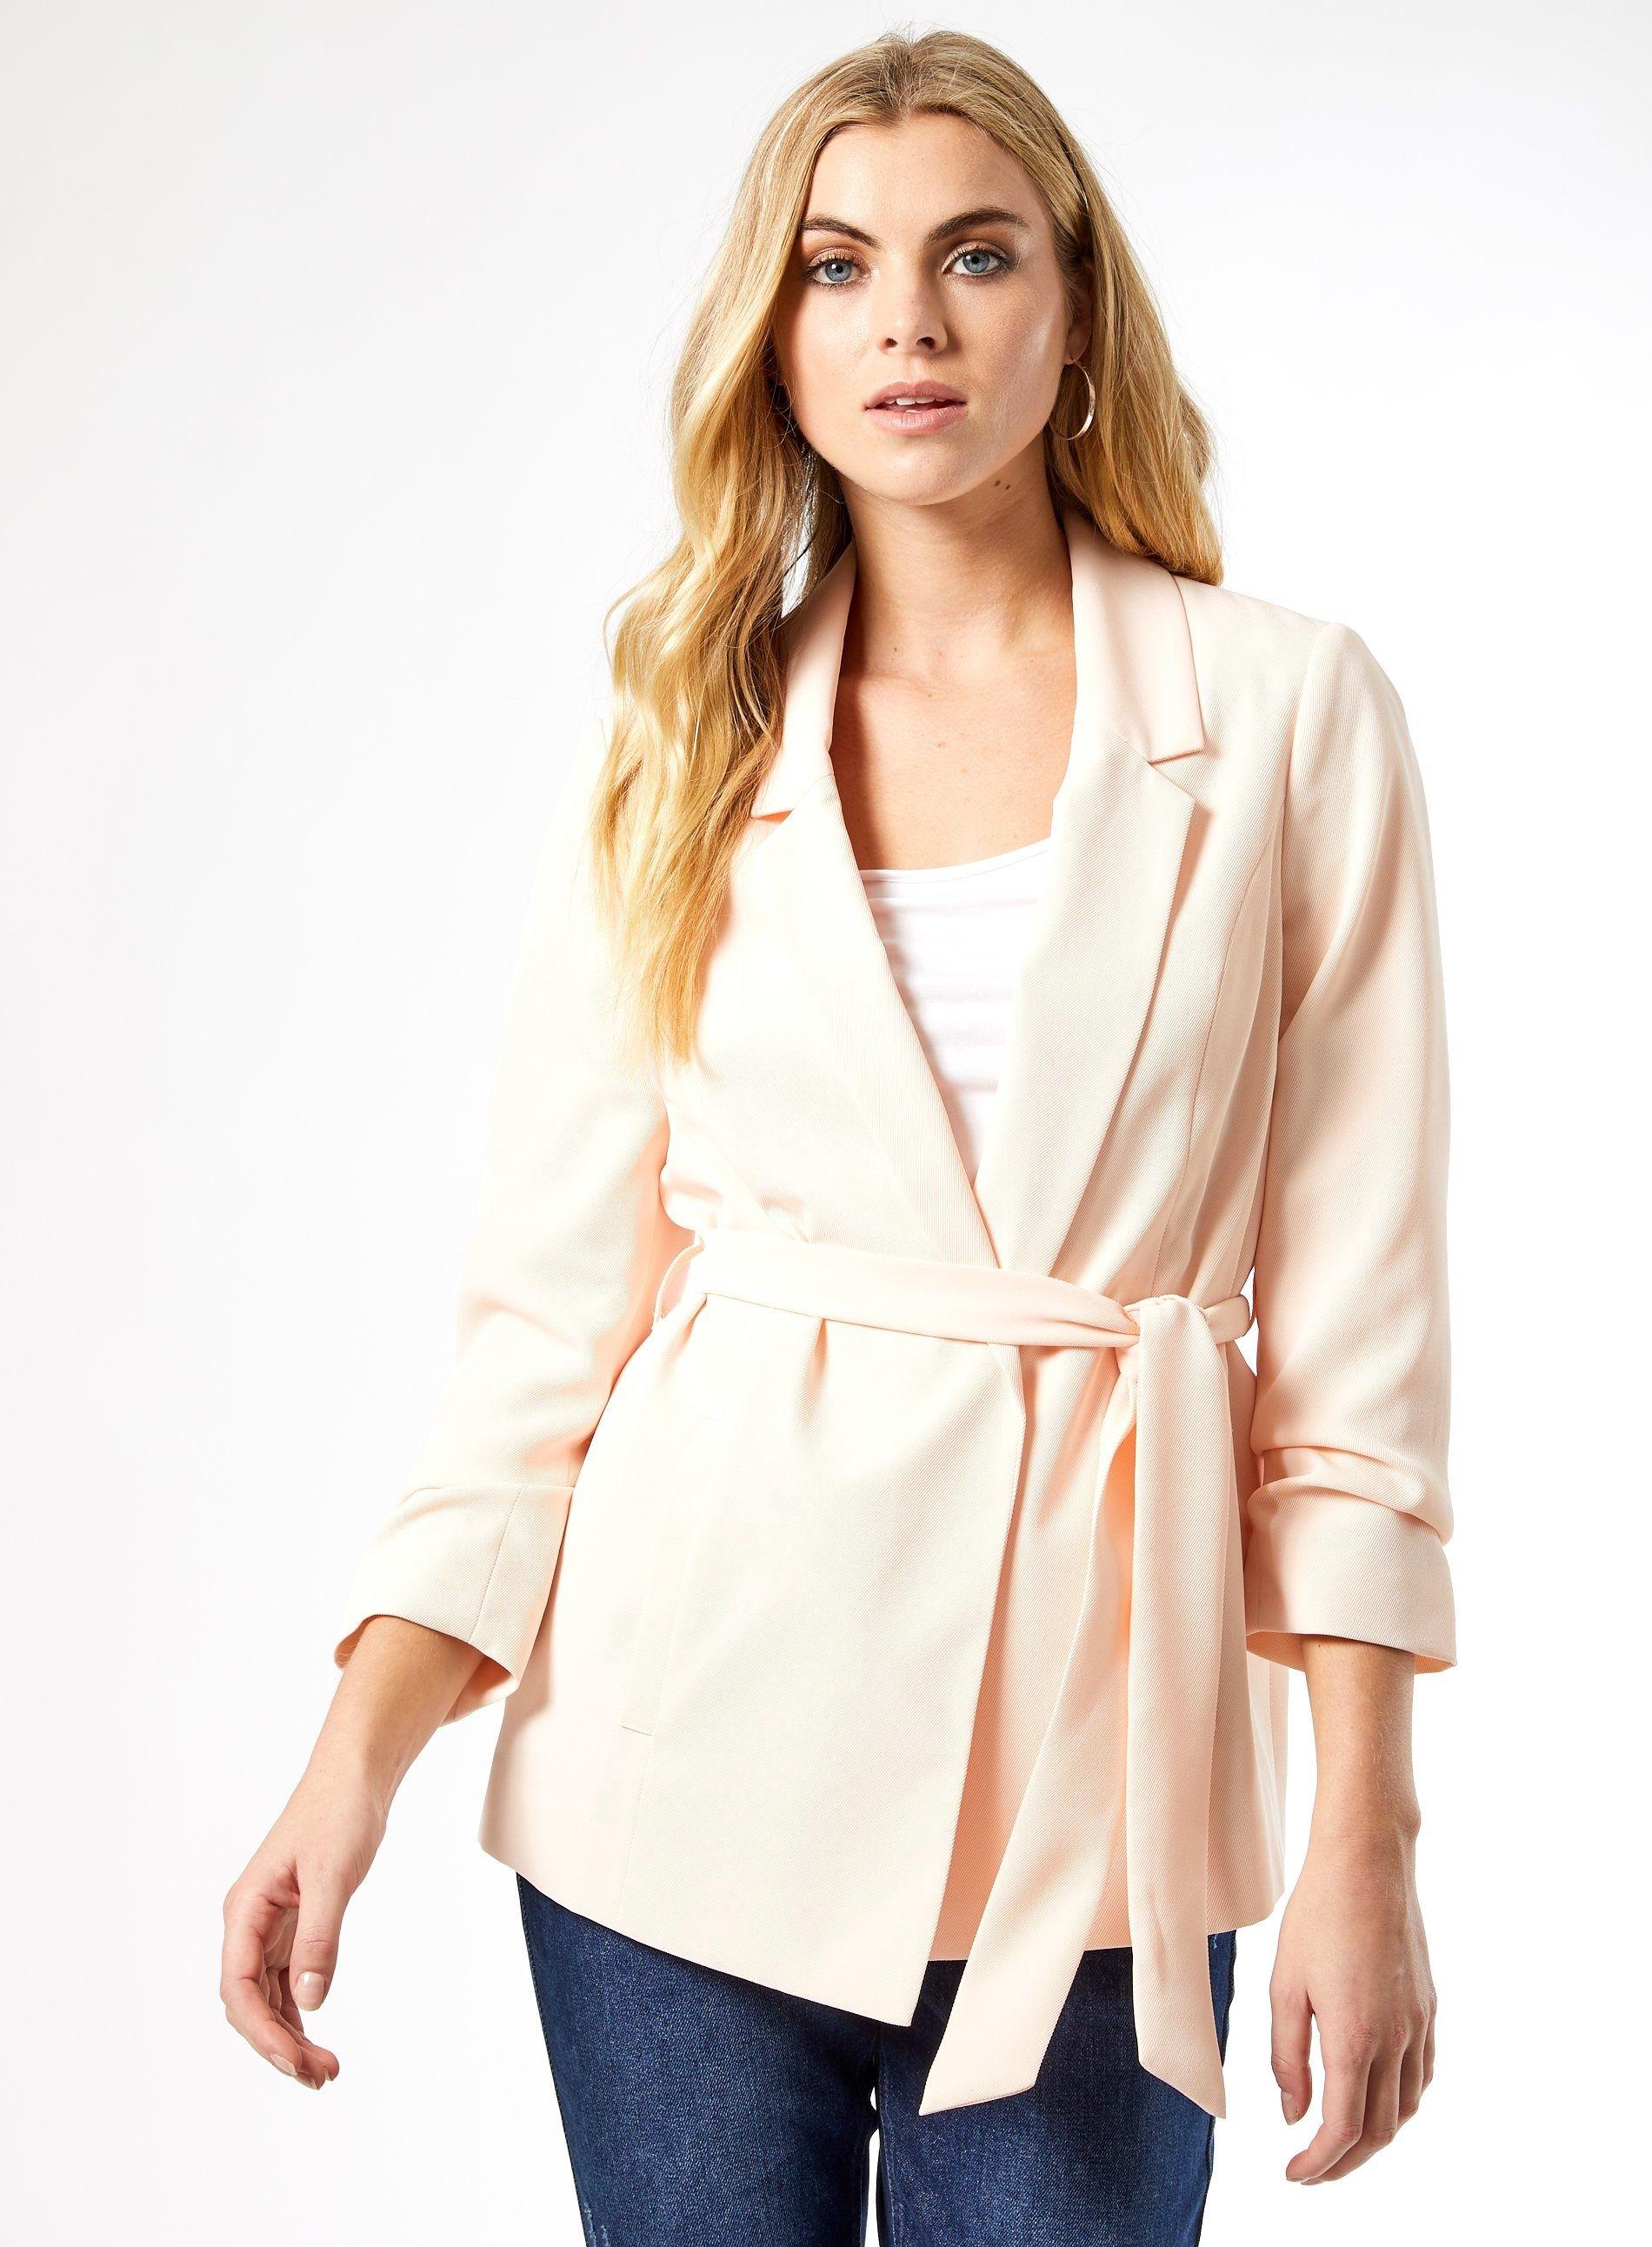 Dorothy Perkins Womens Pink Tie Waist Blazer Jacket Long Sleeve Outerwear Top